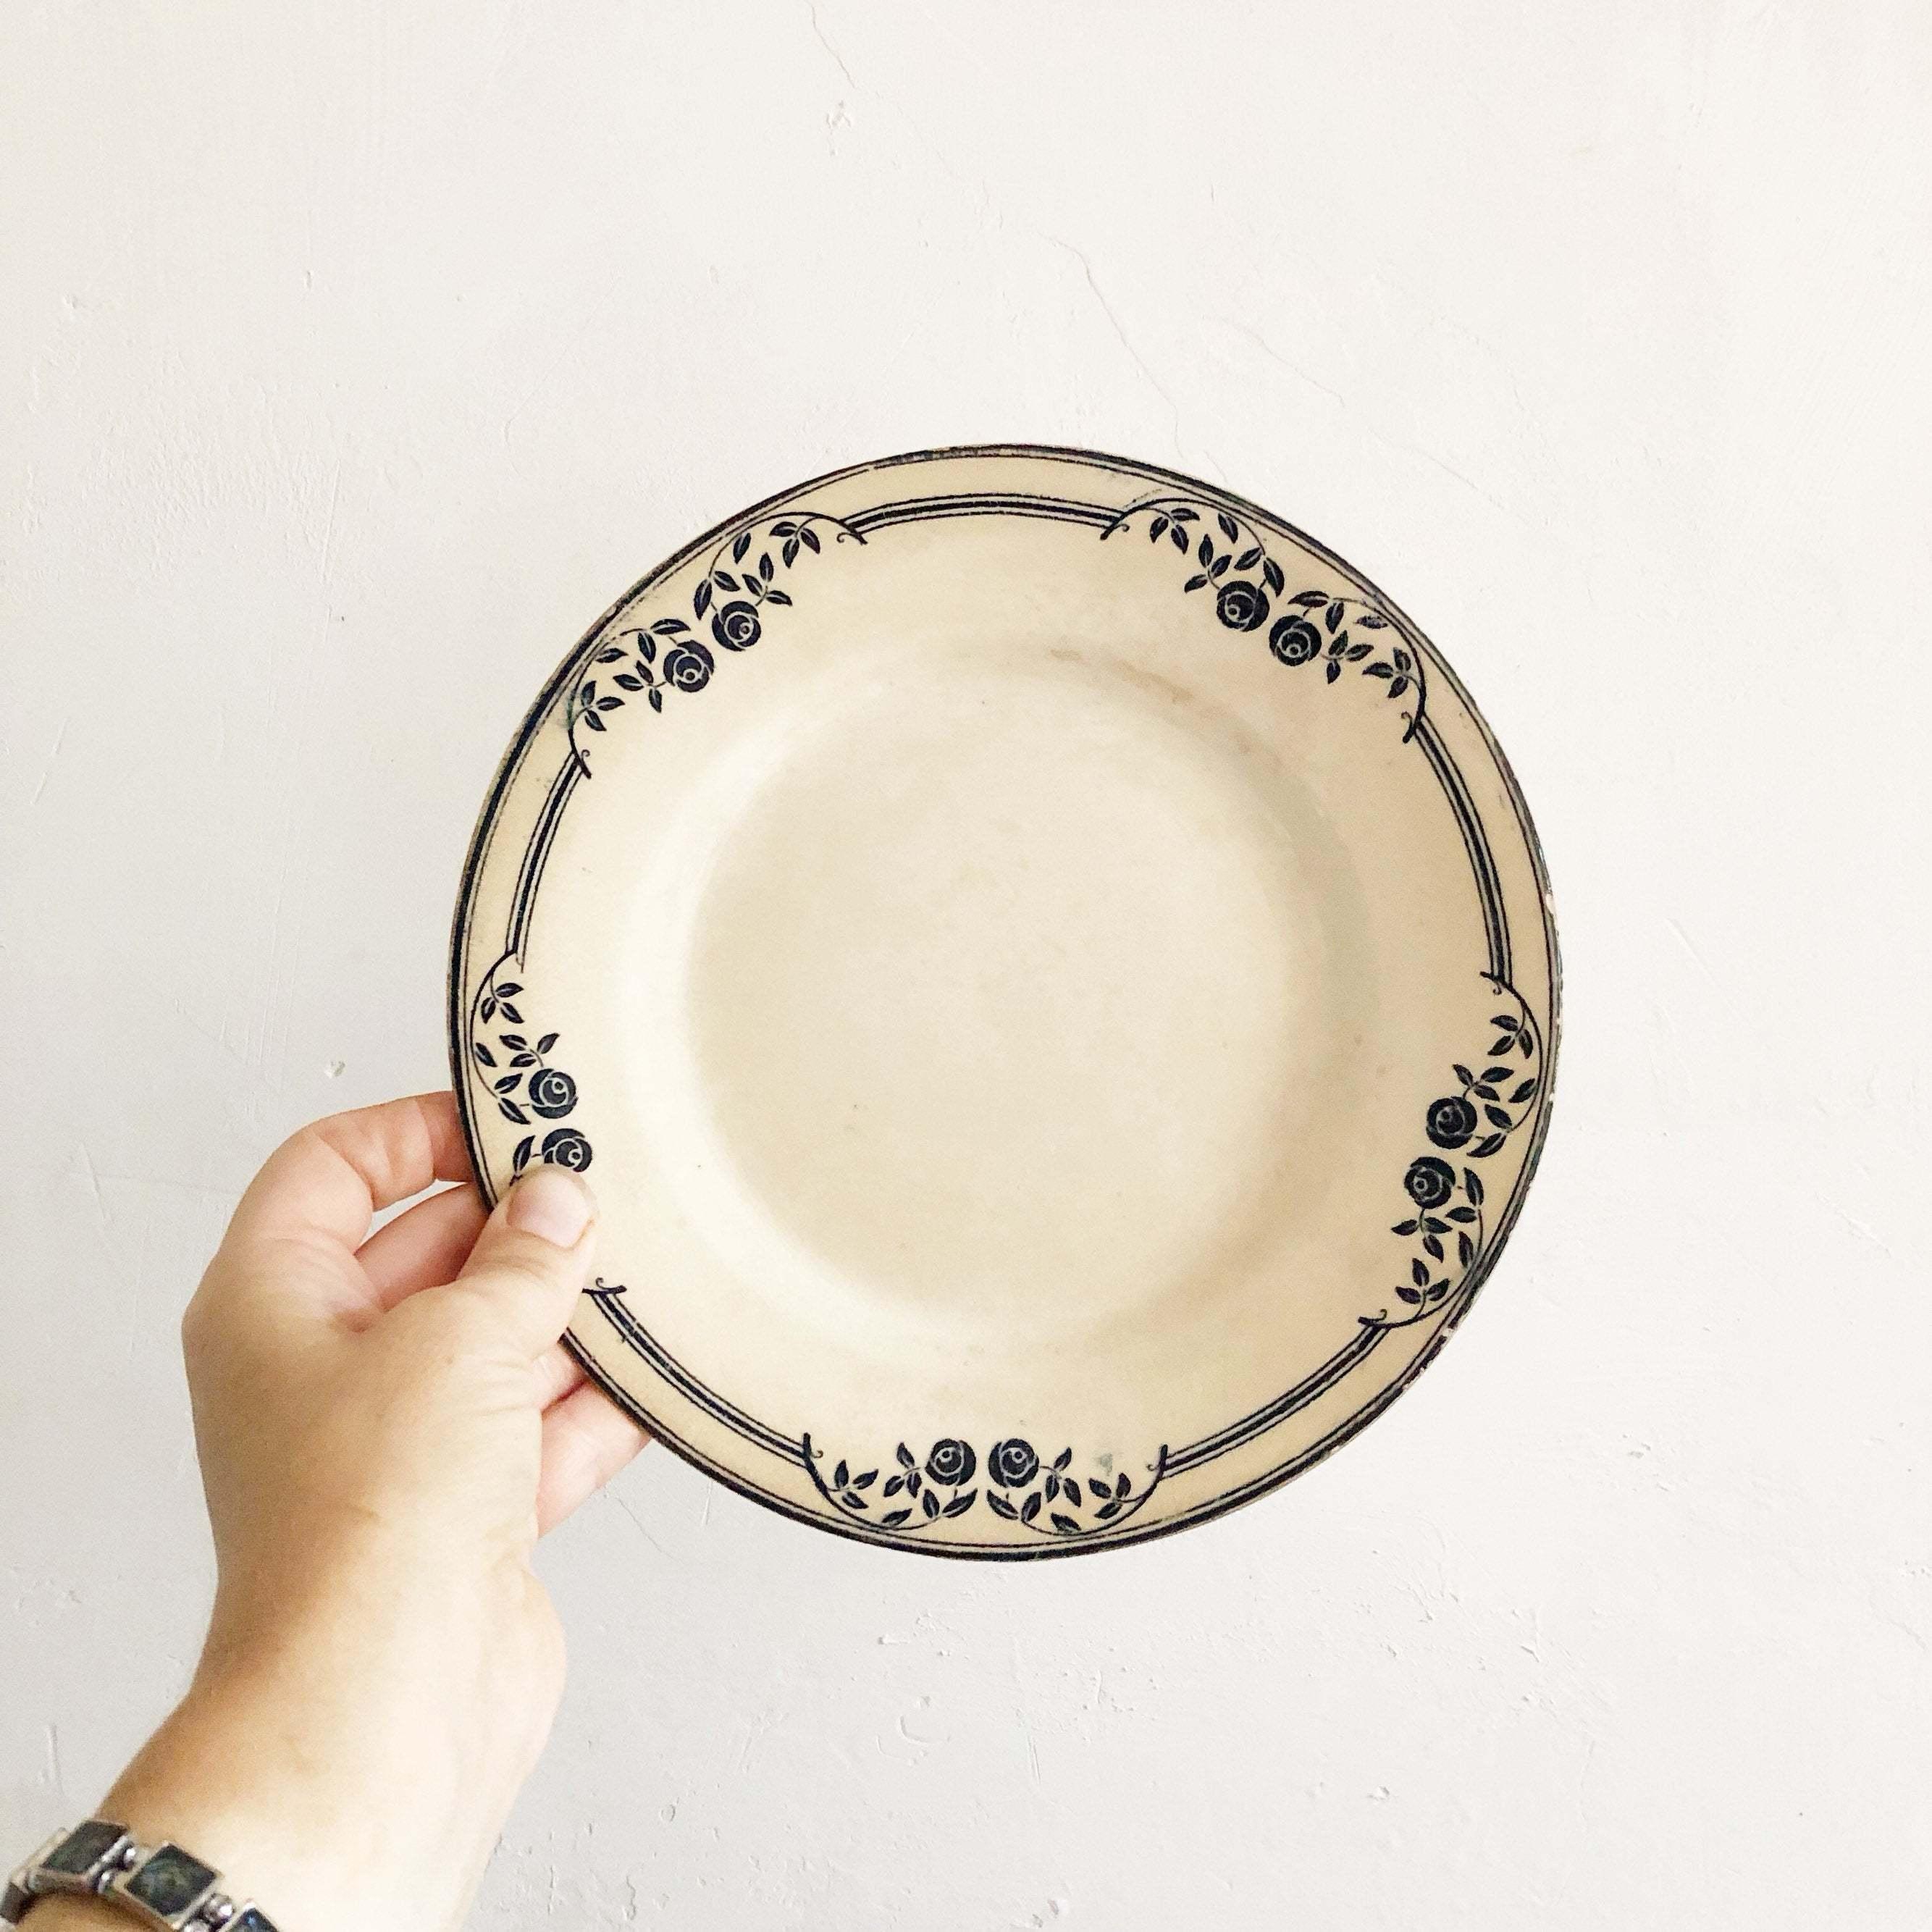 Vintage French Transferware  vintage bowl  vintage pottery  vintage ceramics  vintage crockery vintage earthenware